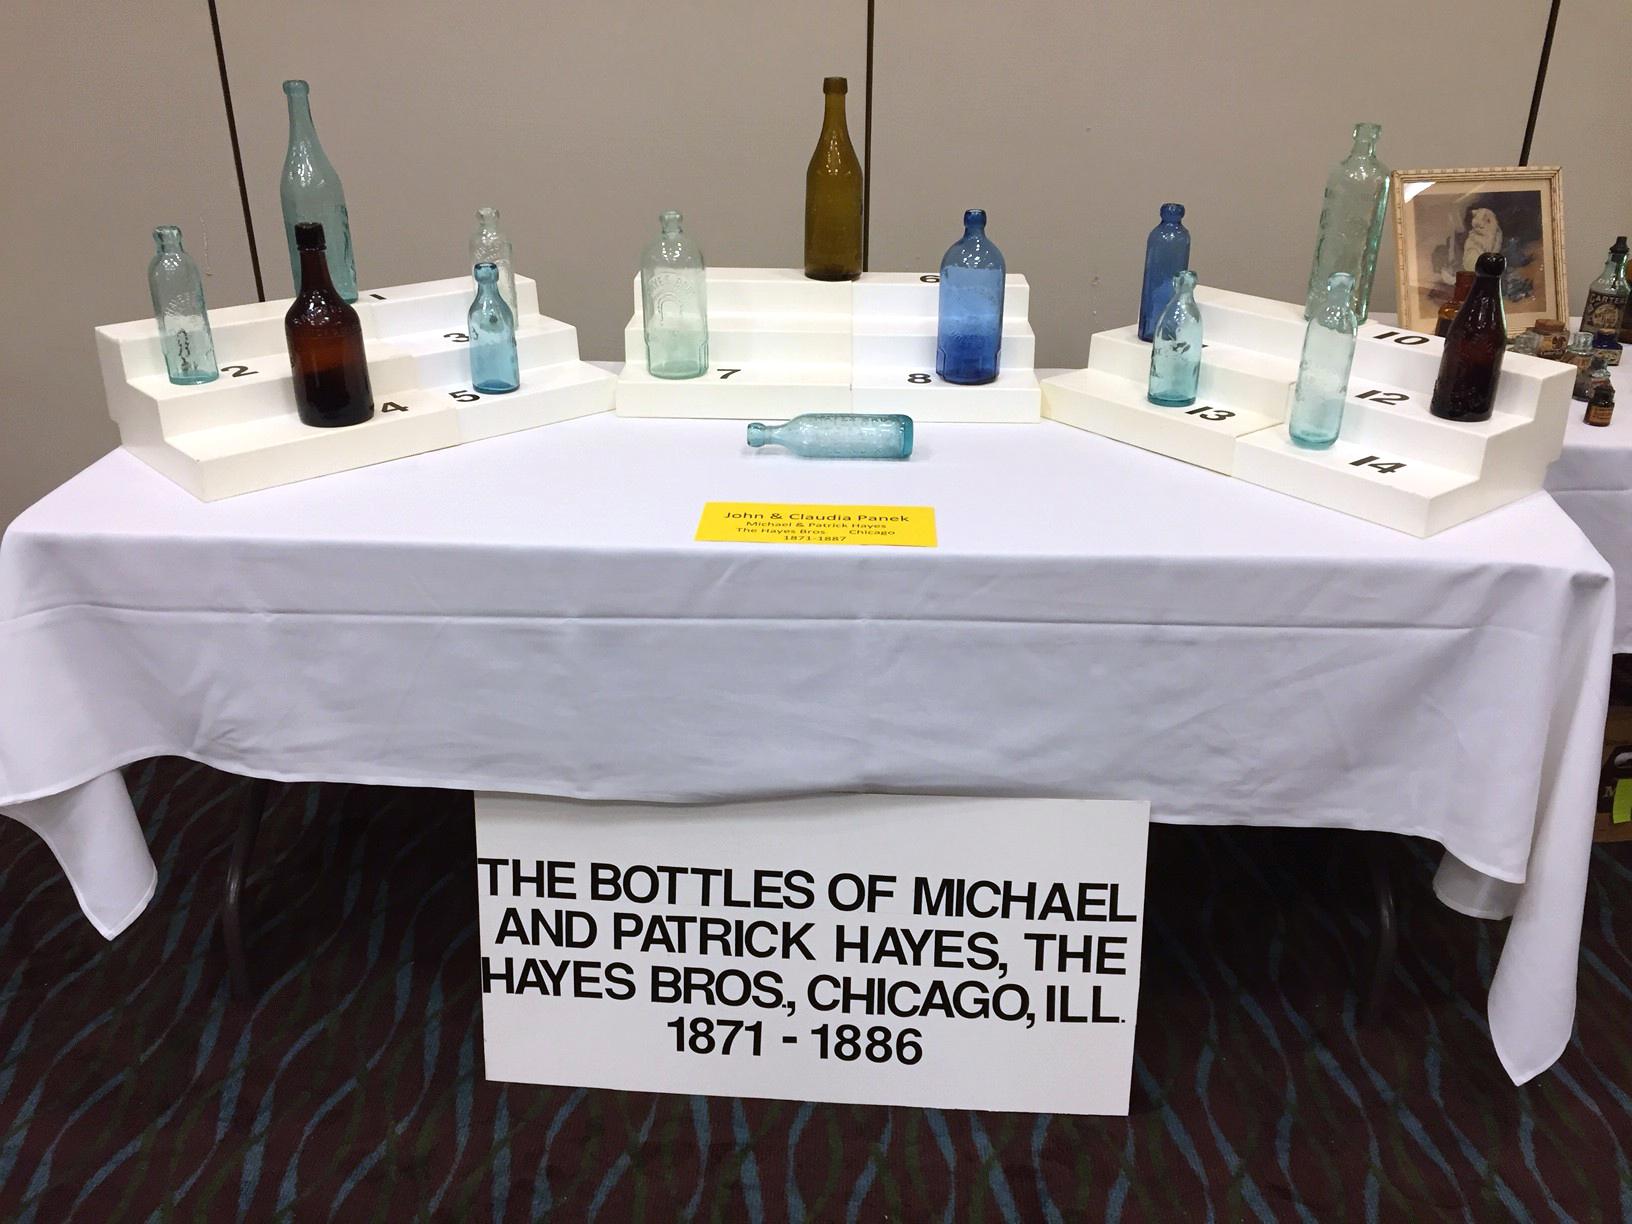 Hayes Bros. Bottles